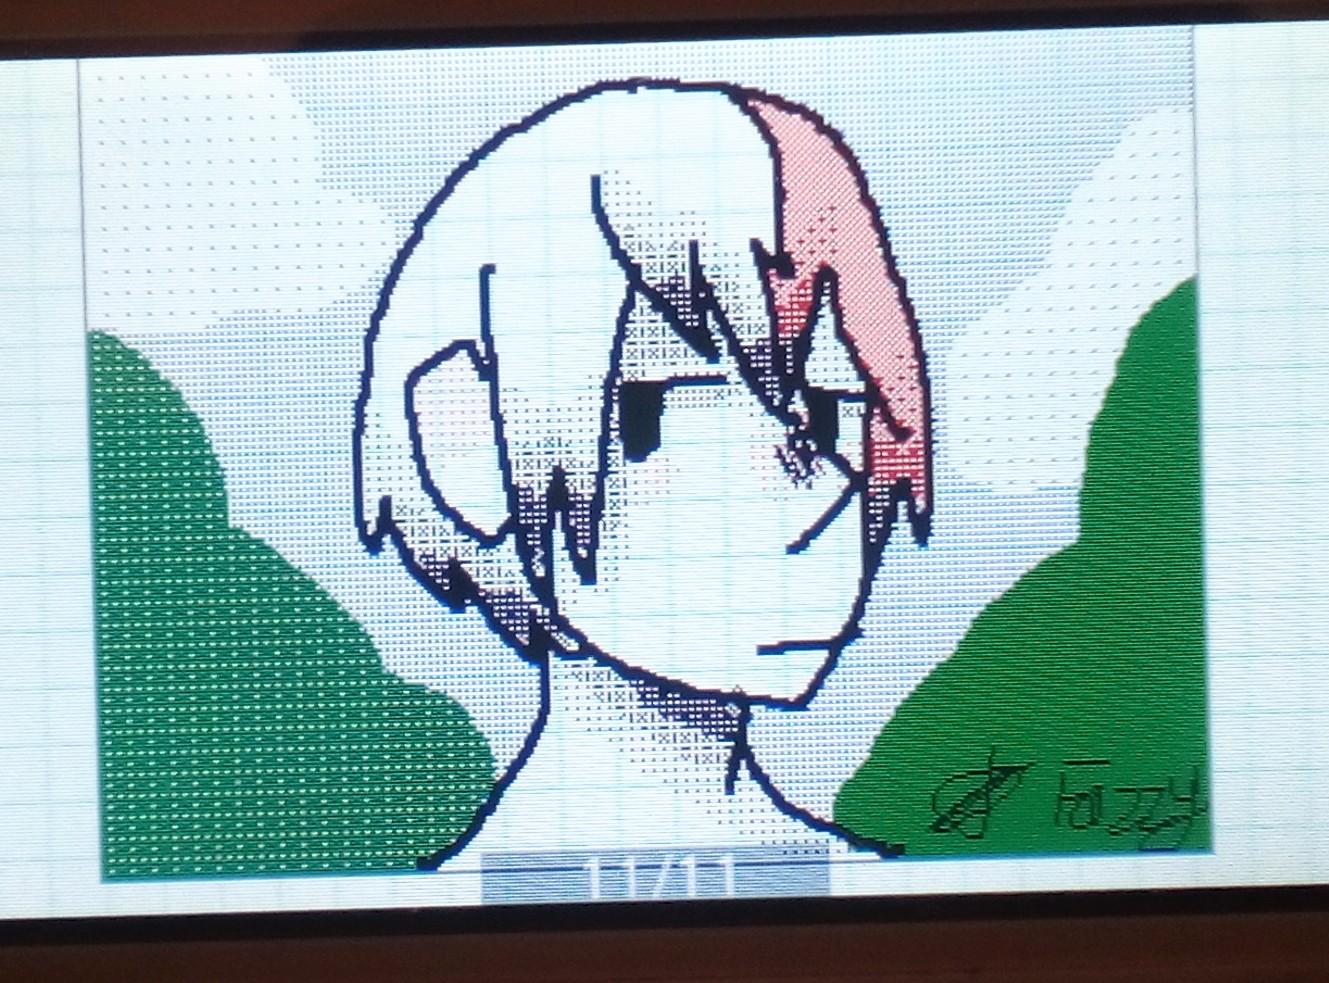 main-image-Flipnote Drawing uploaded by Pixel-Fazzy